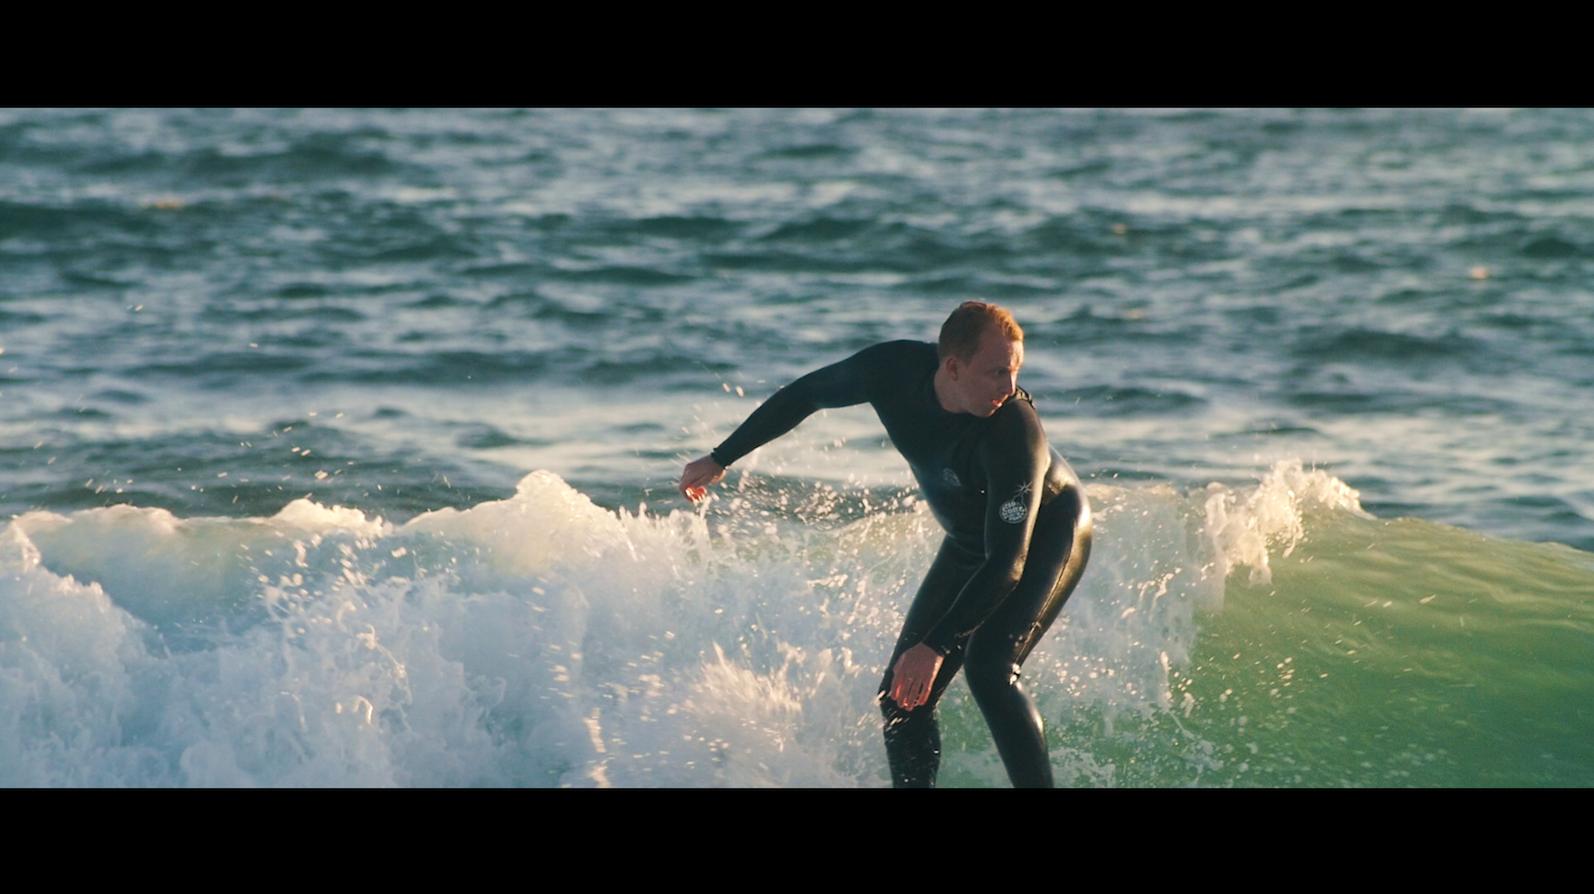 Lululemon Surfing Commercial